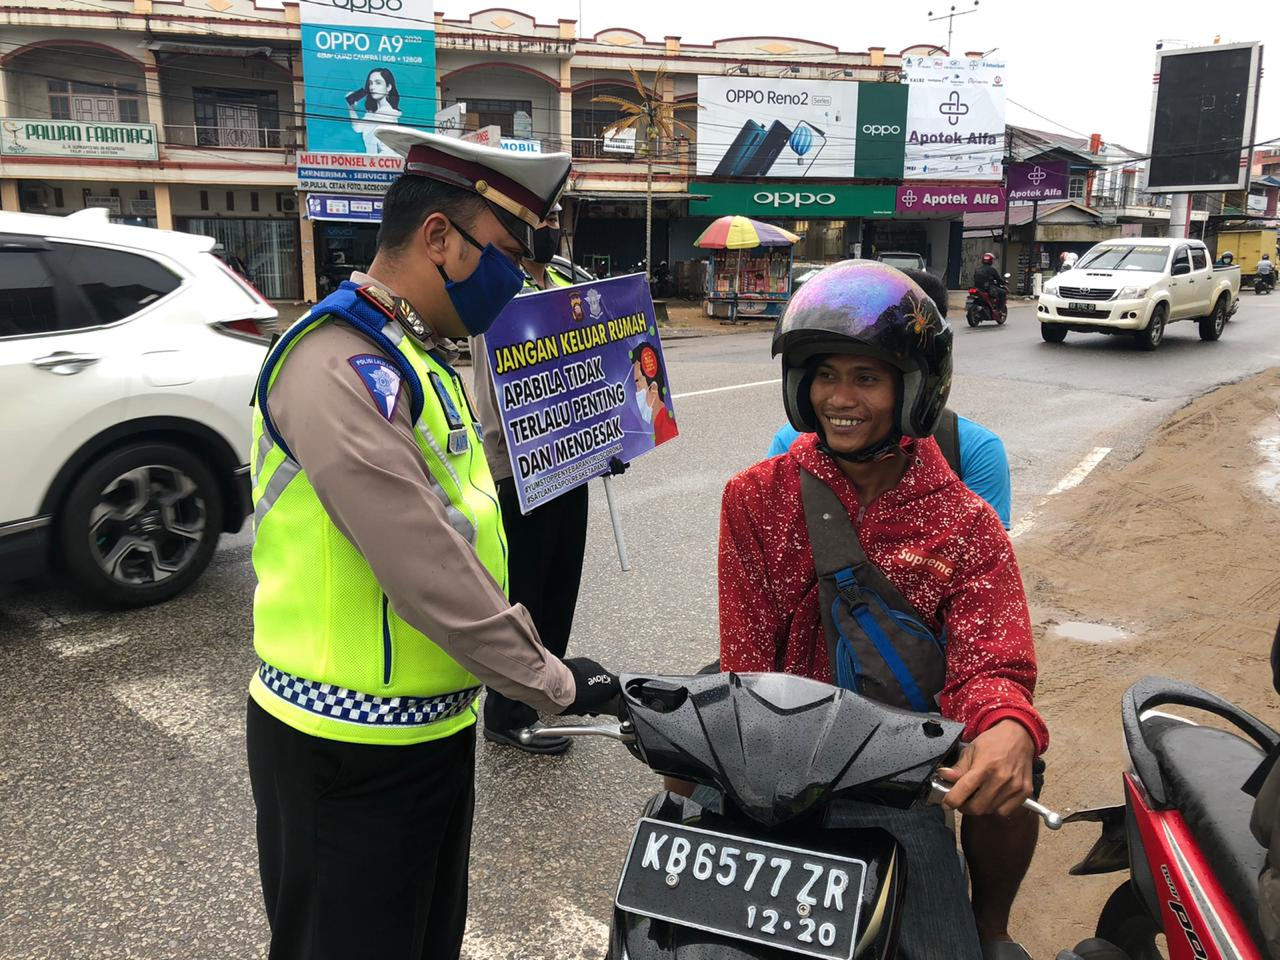 Tingkat Kesadaran Warga Masih Rendah, Polisi Lakukan Razia Pengendara Tak Gunakan Masker